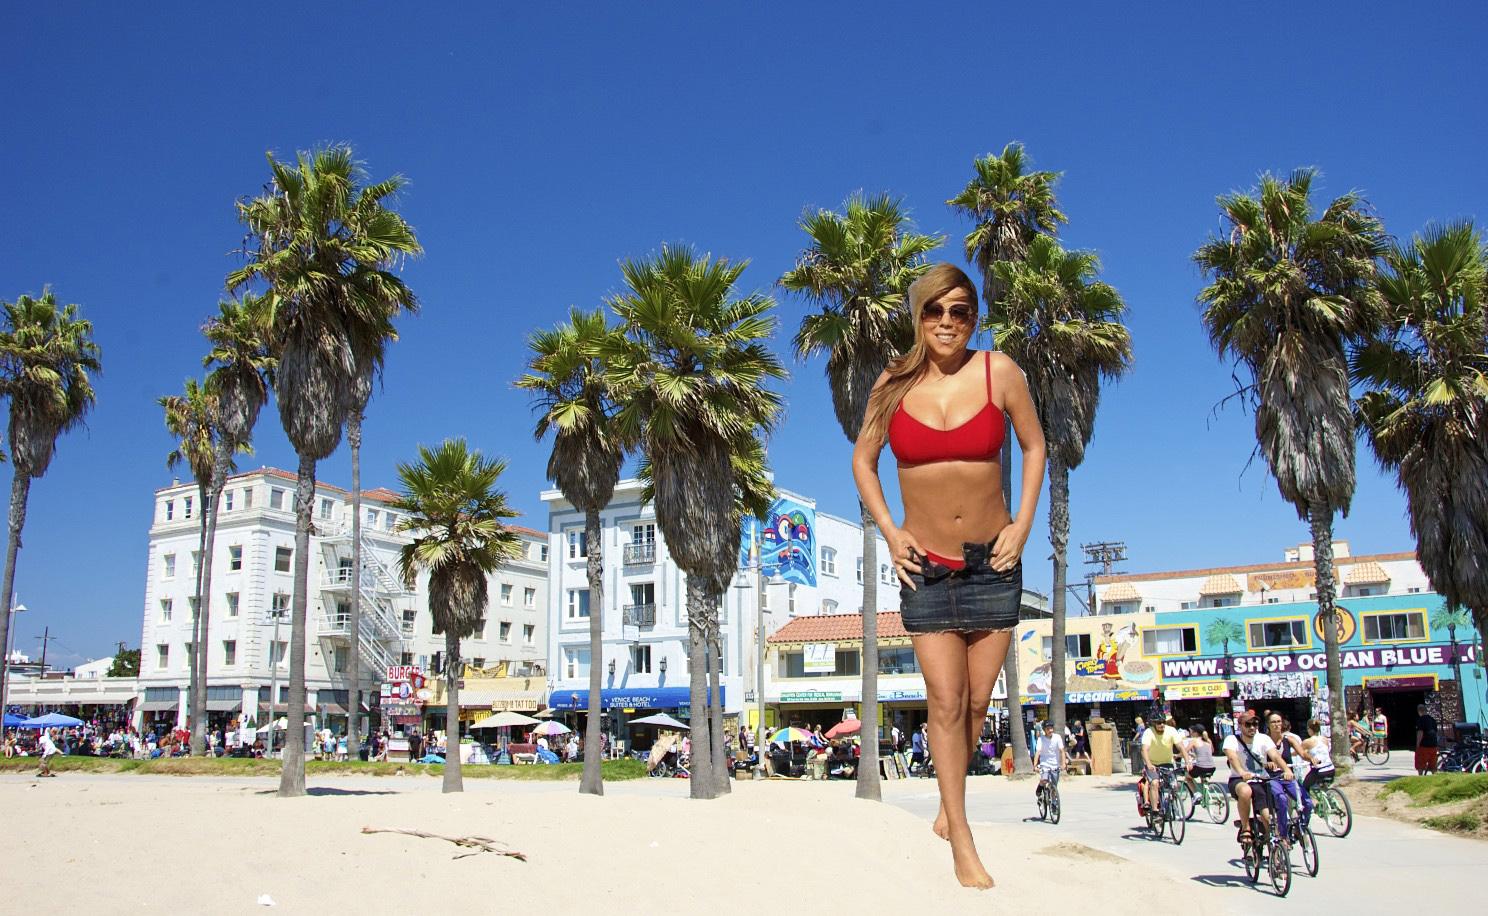 Giantess Carrei: Giantess Mariah Carey At Venice Beach By Jjuenger On